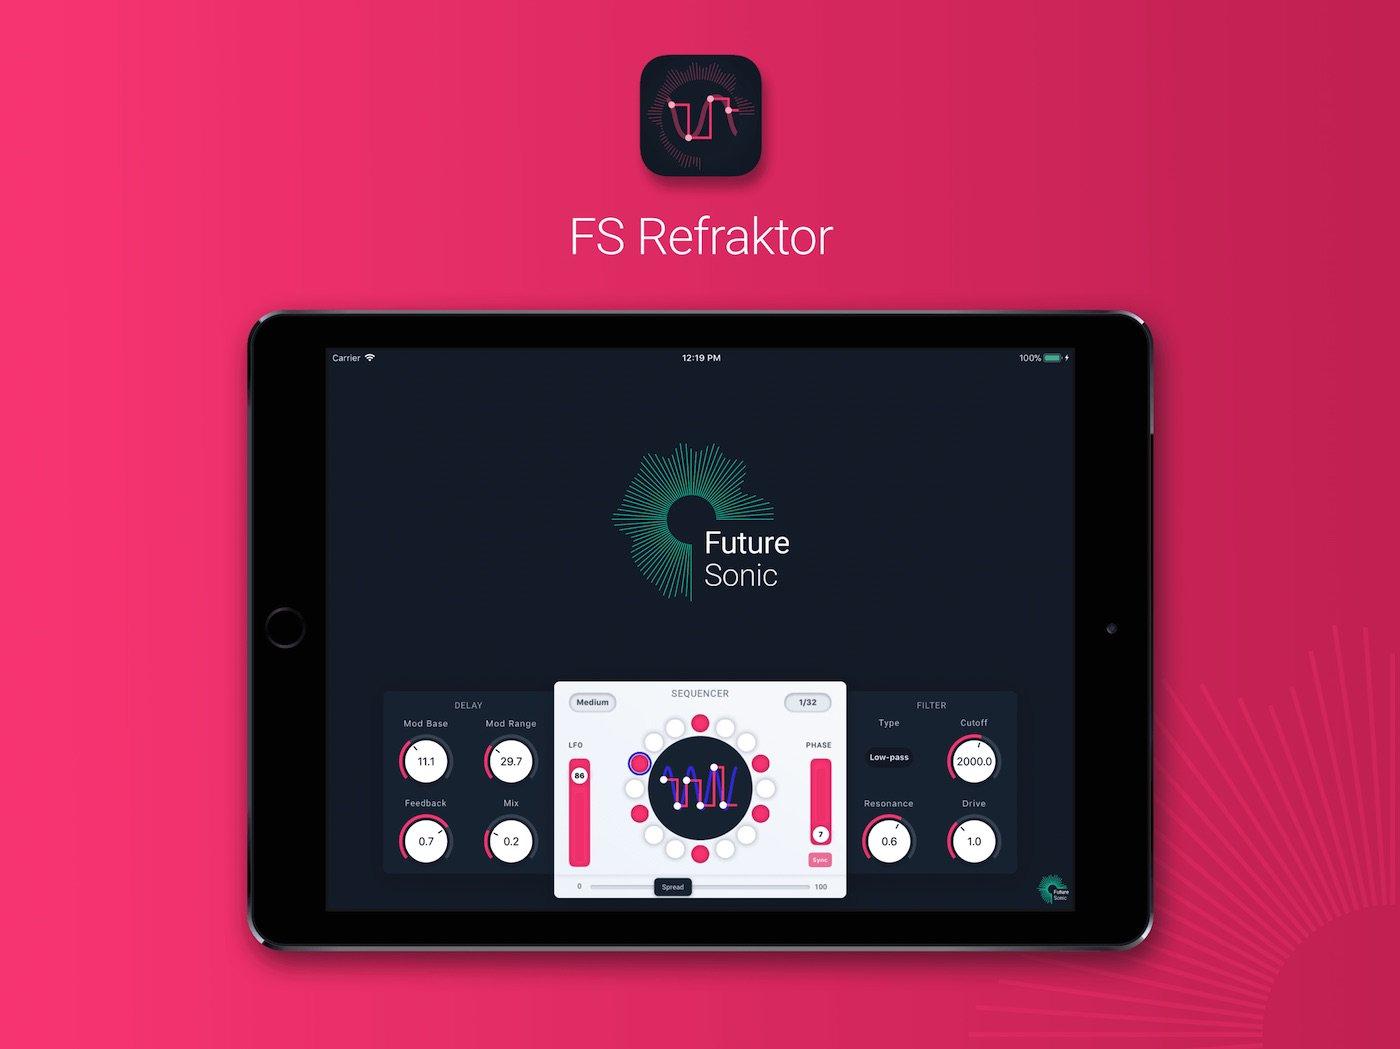 FS Refraktor Flanger App